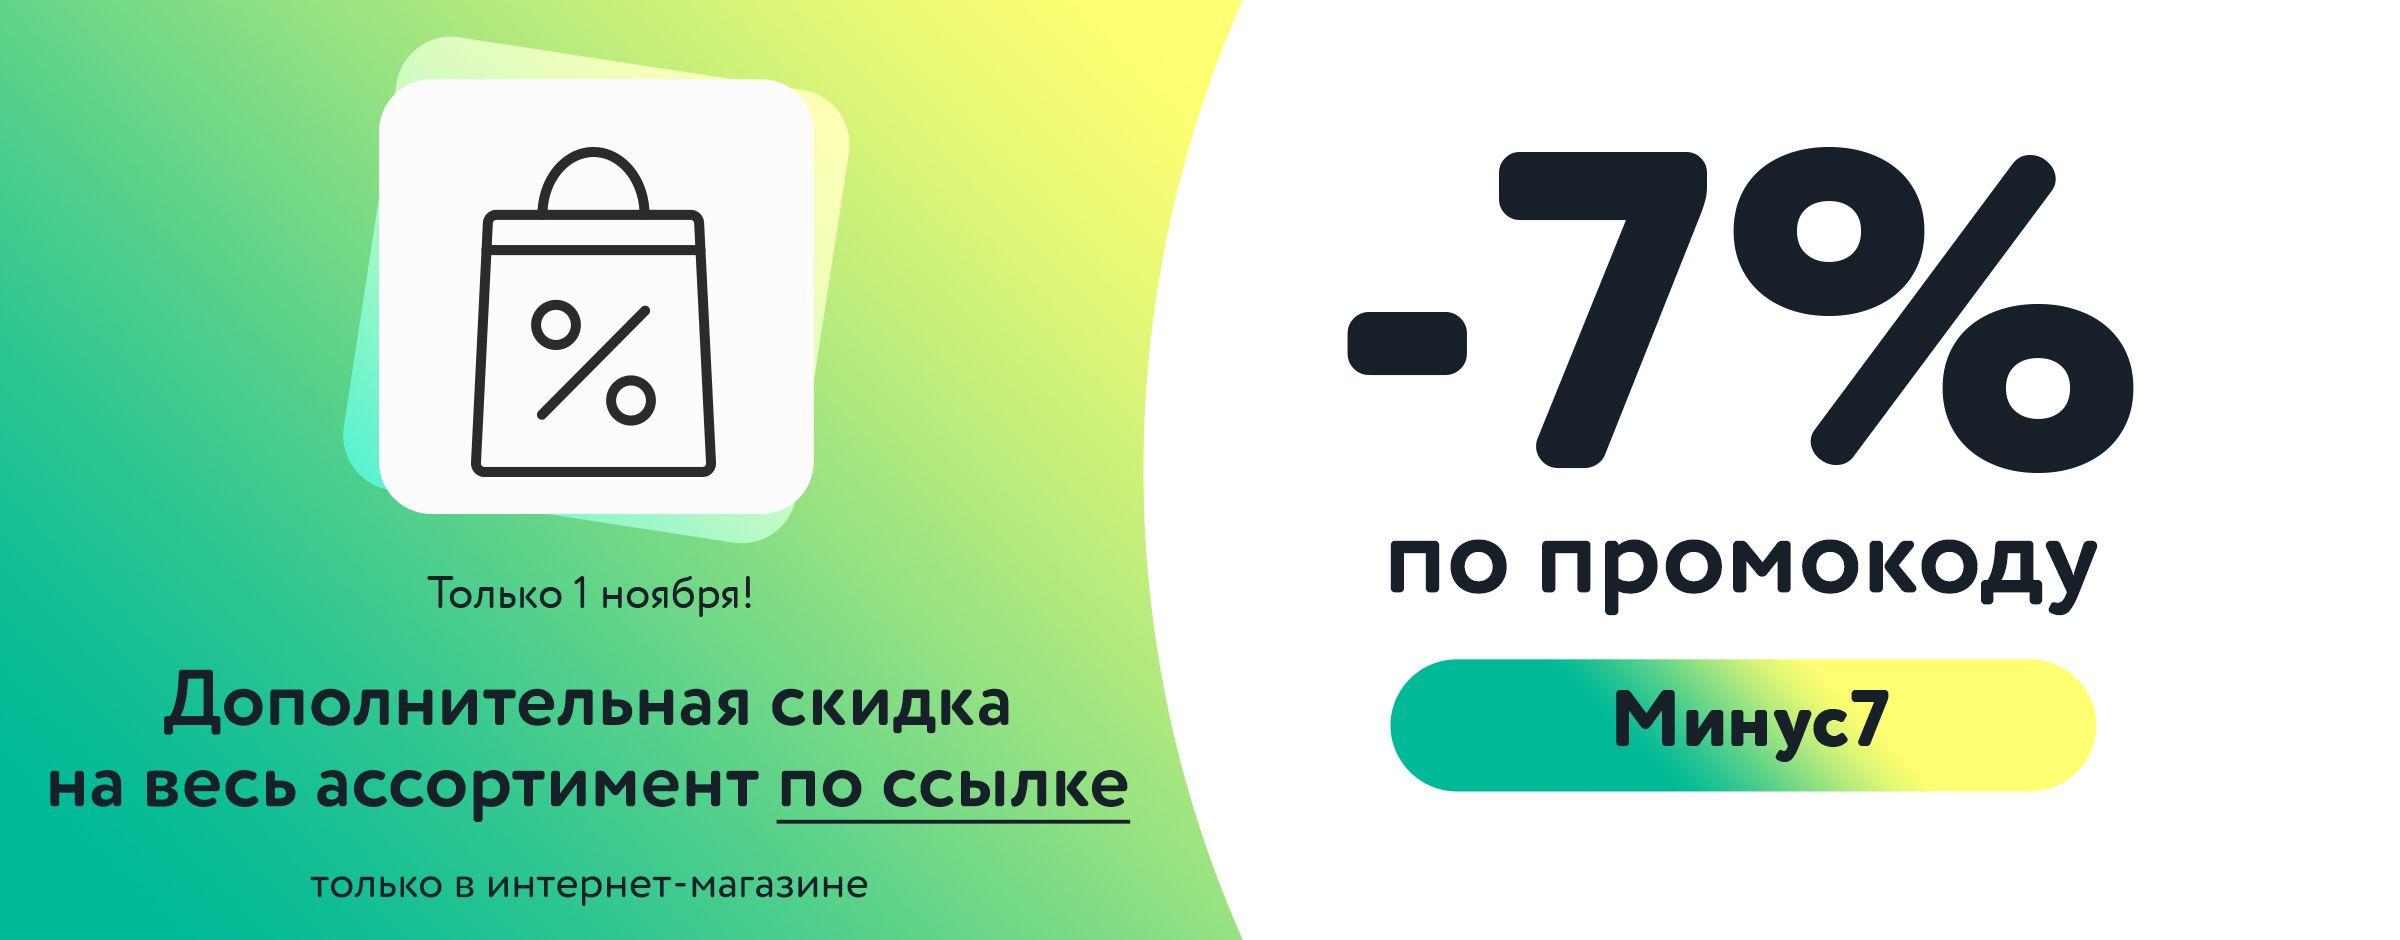 7% по промокоду Минус7